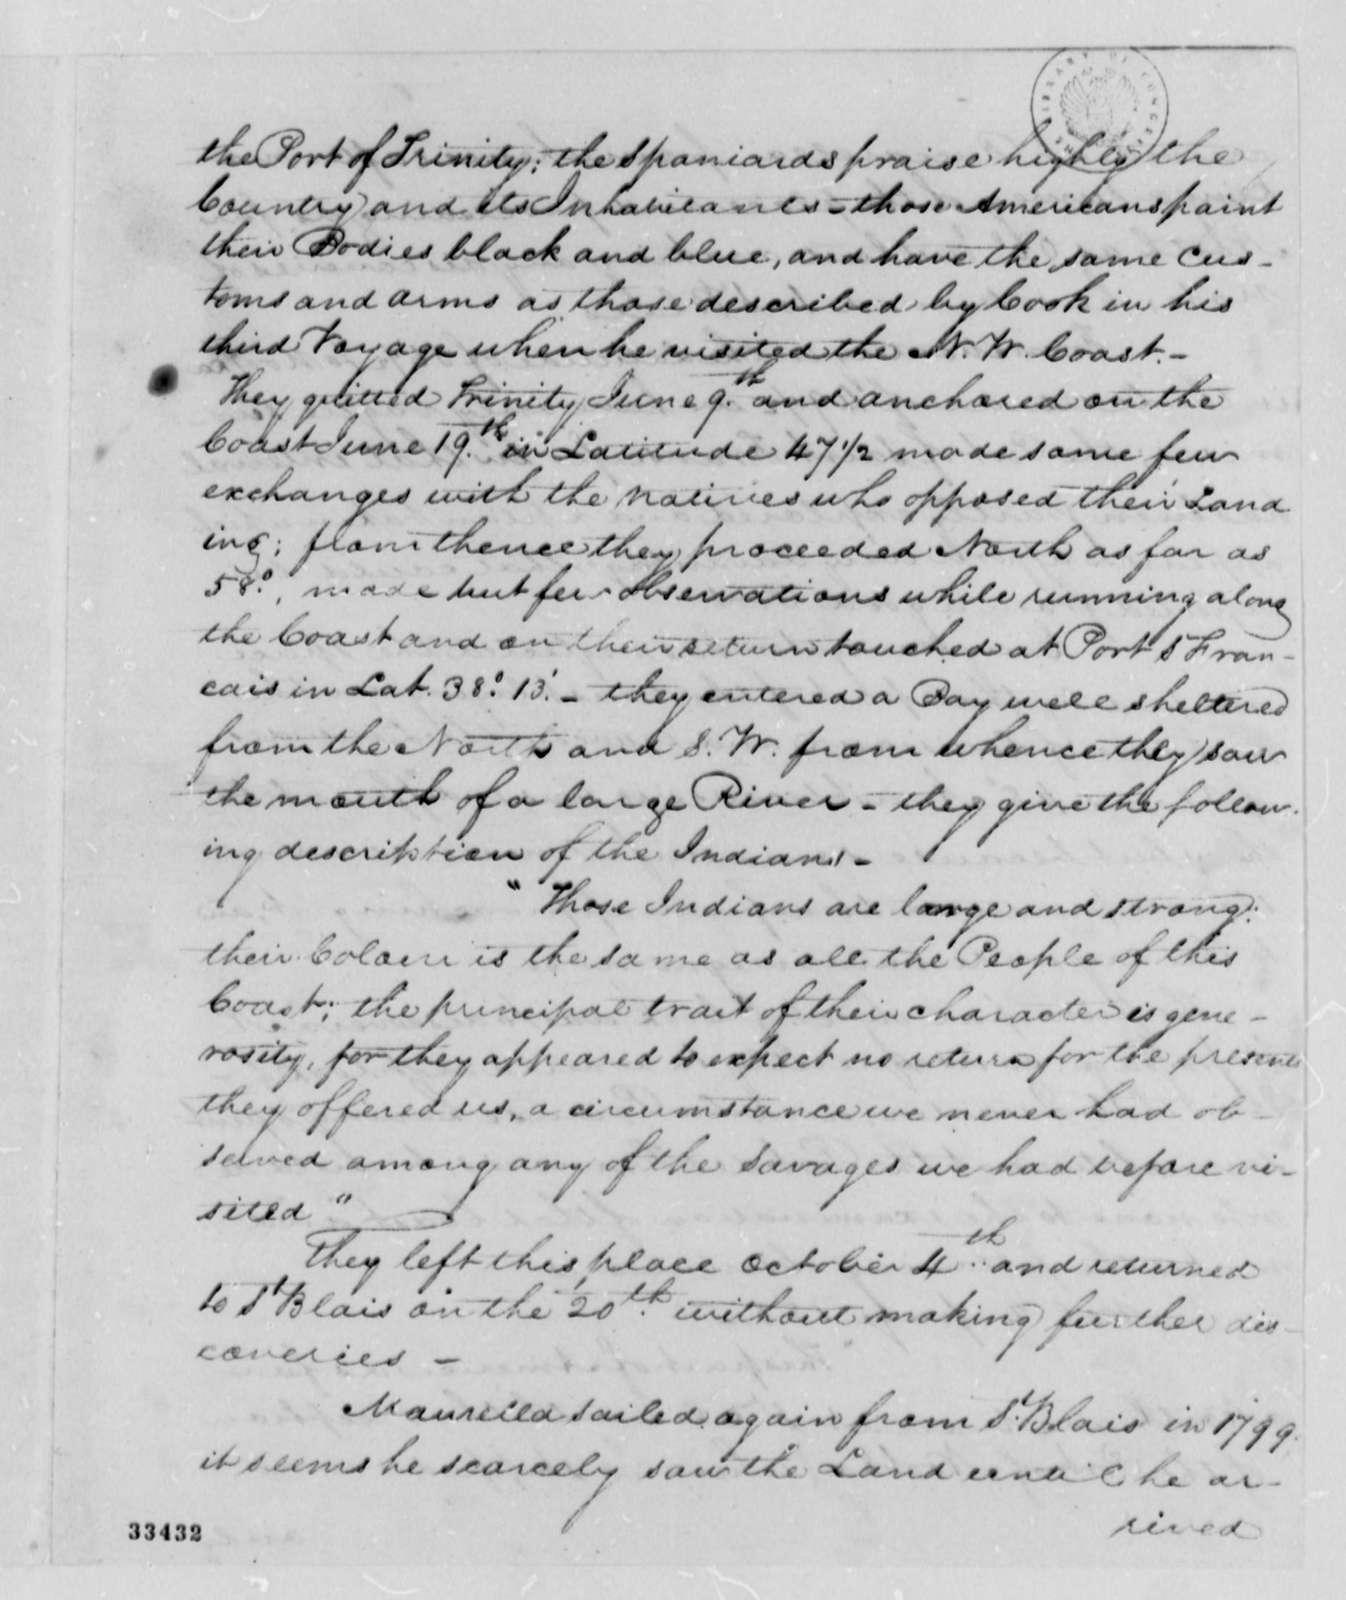 David Porter to Thomas Jefferson, August 17, 1809, and Prospectus